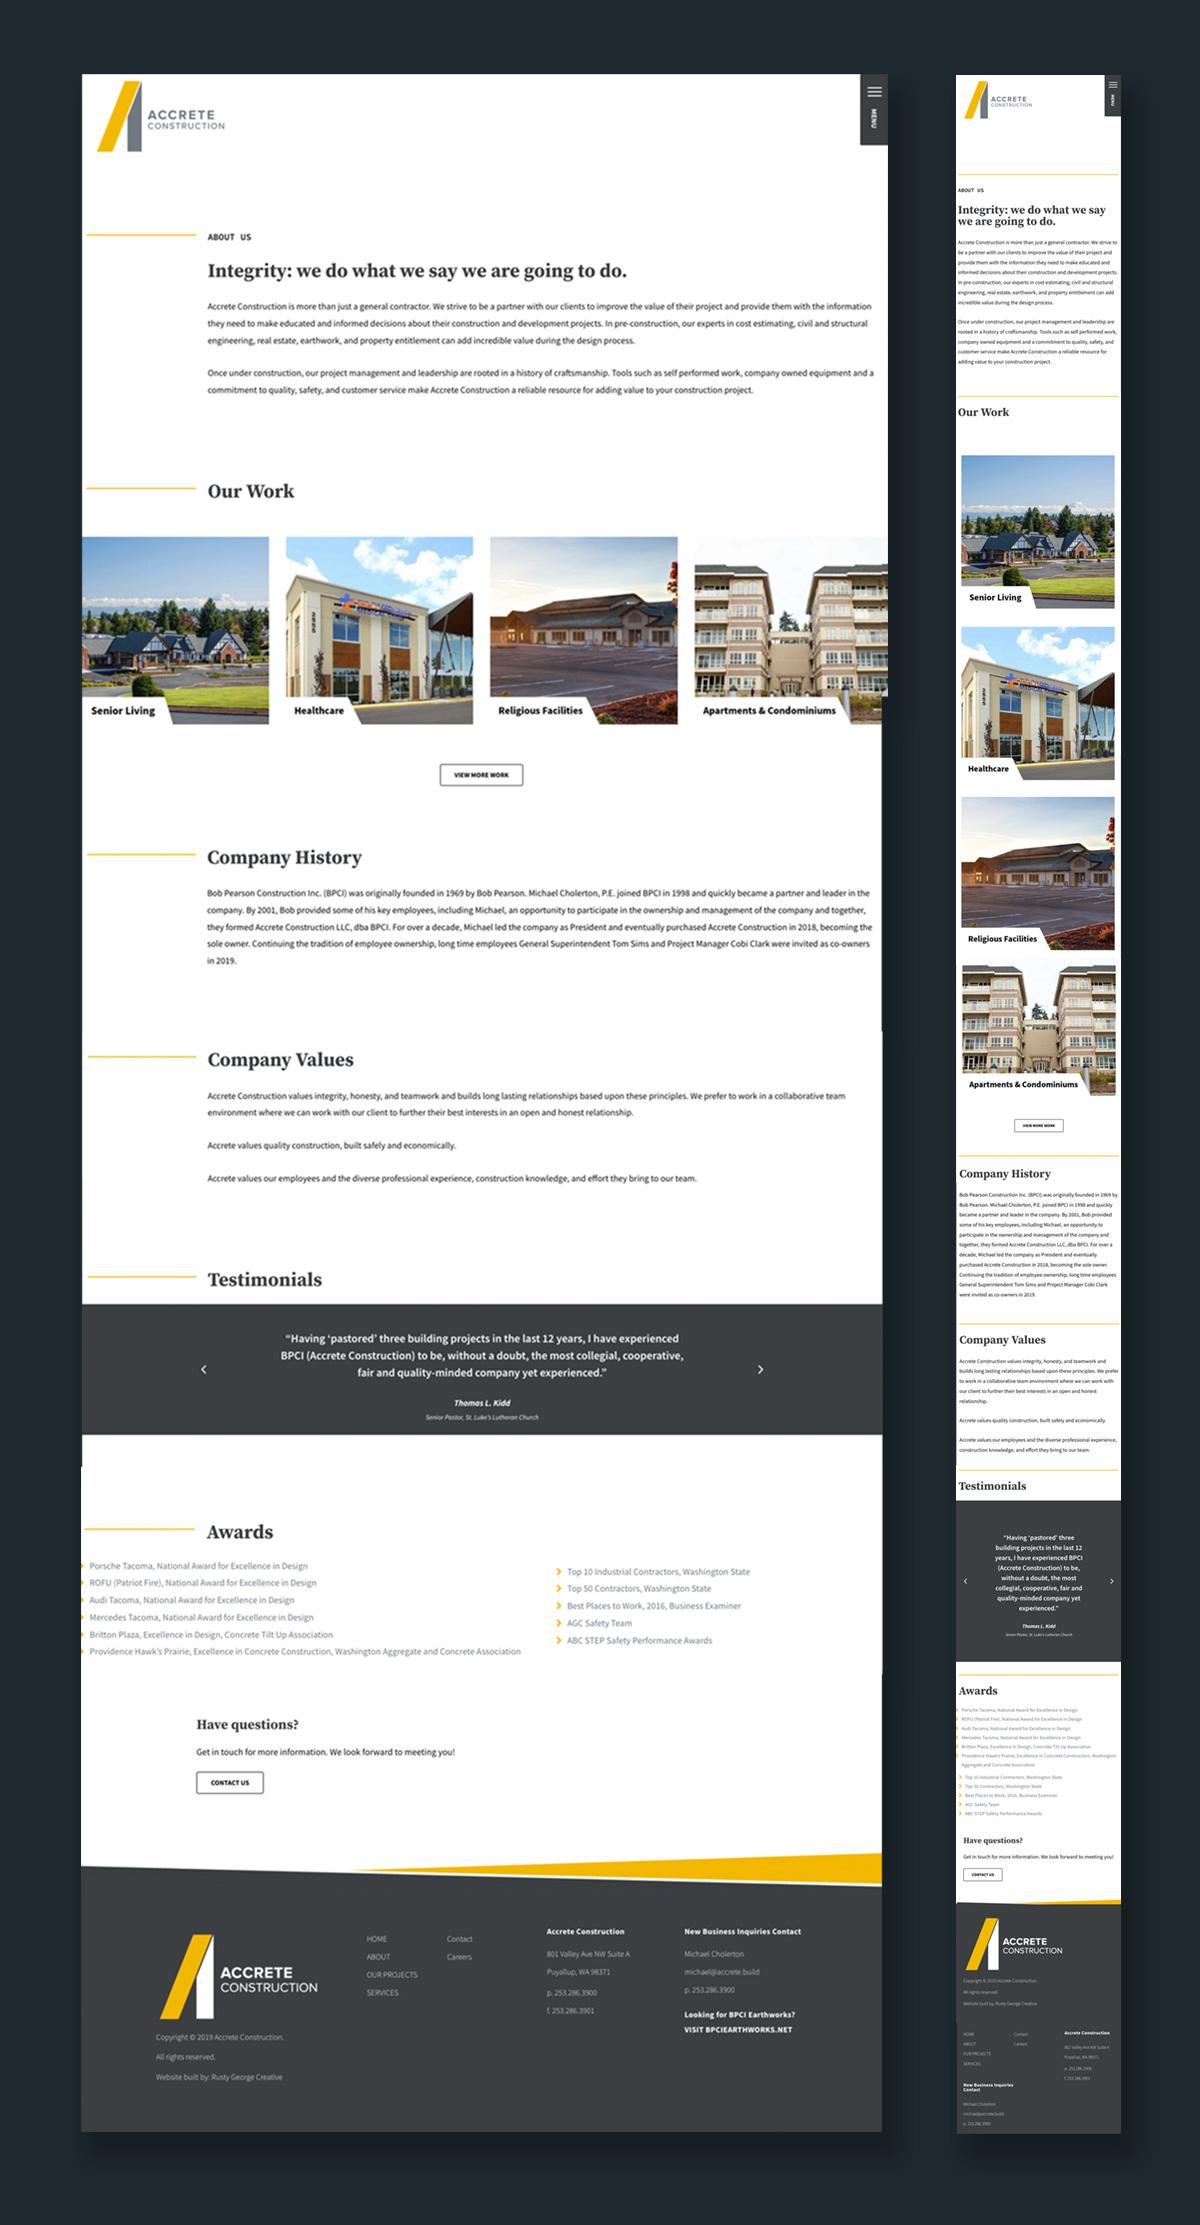 accrete construction commercial construction services in Western Washington website design